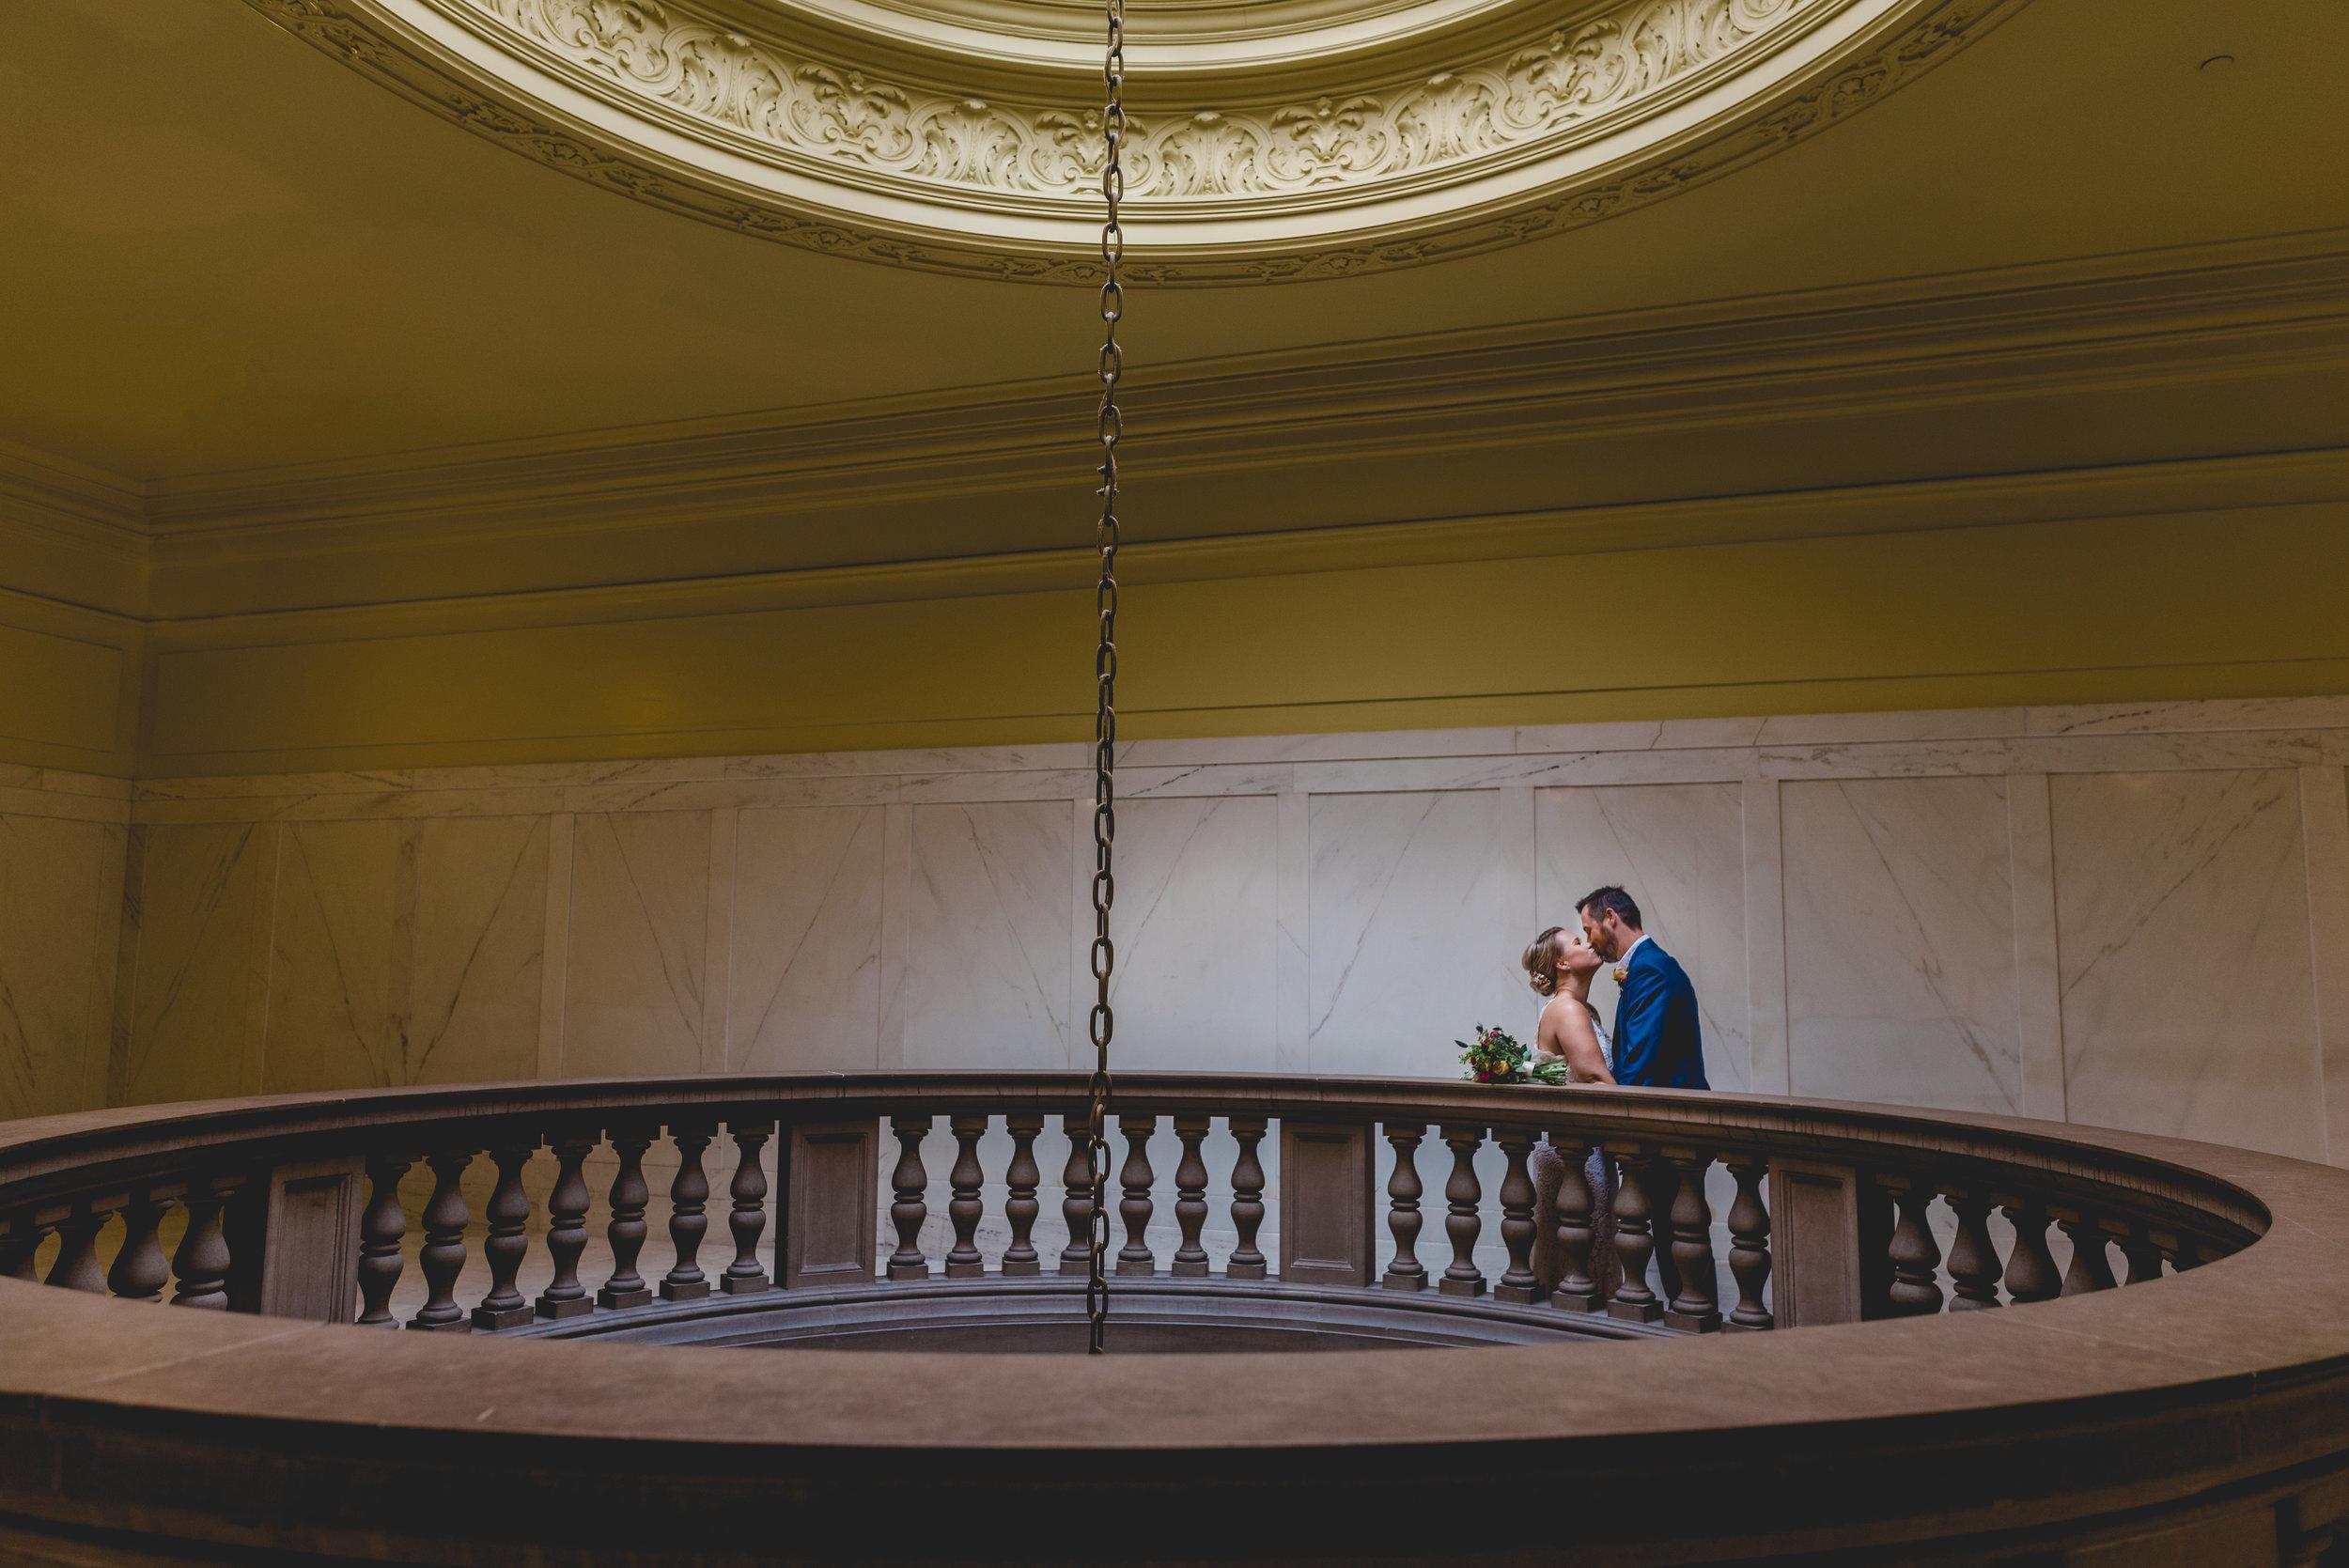 mcdaniels_conroy-wedding-couple-95.jpg